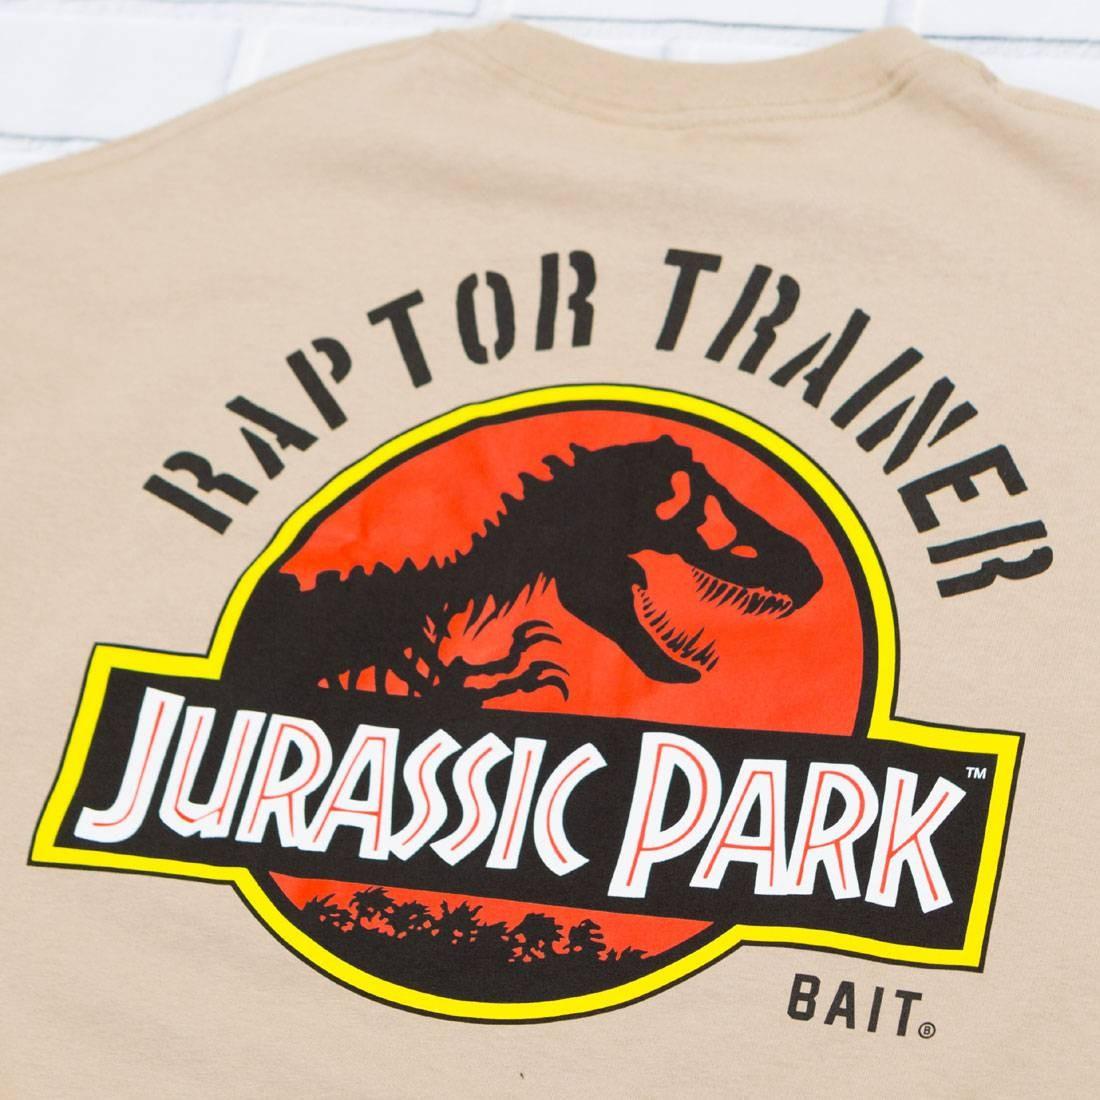 e9c4d2a3 BAIT x Jurassic Park Men Raptor Trainer Tee (tan / sand)